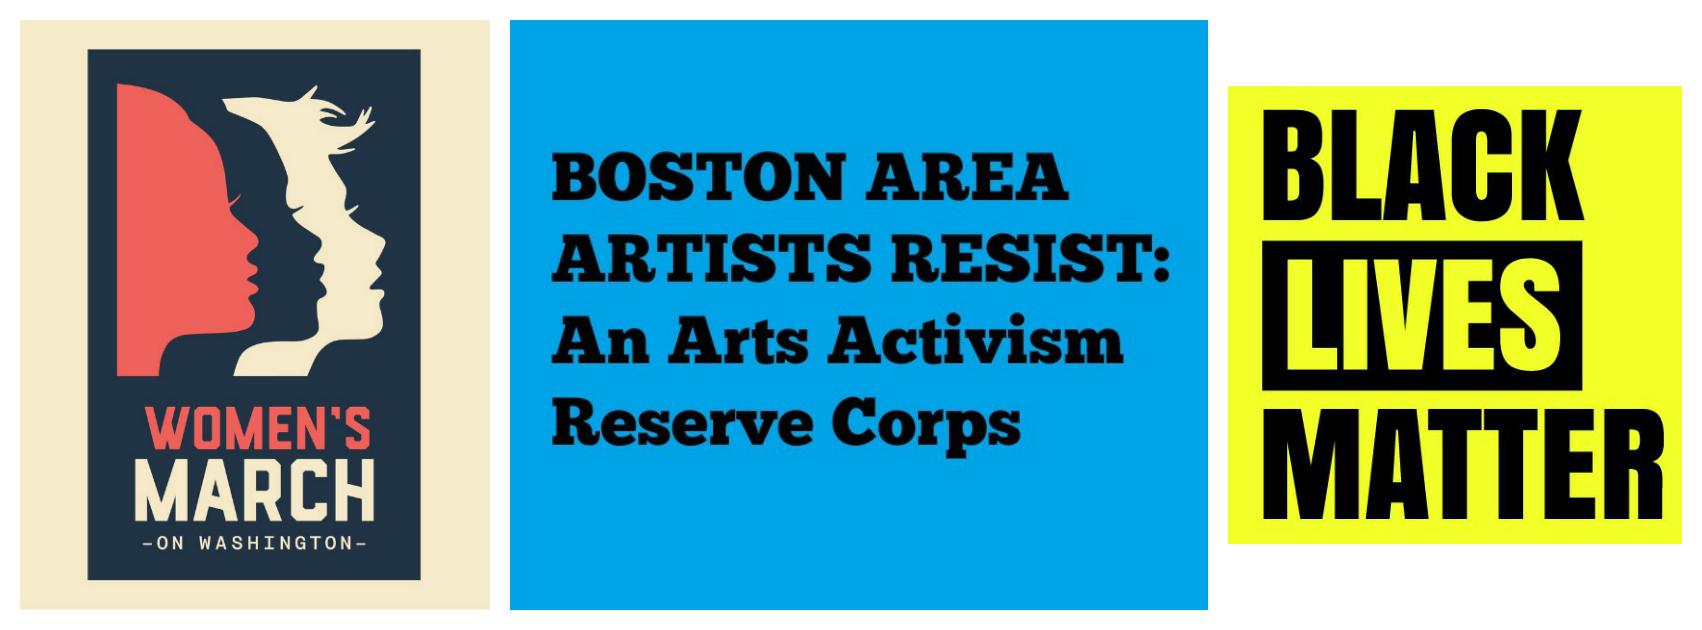 Boston Area Artists Resist: An Arts Activism Reserve Corps